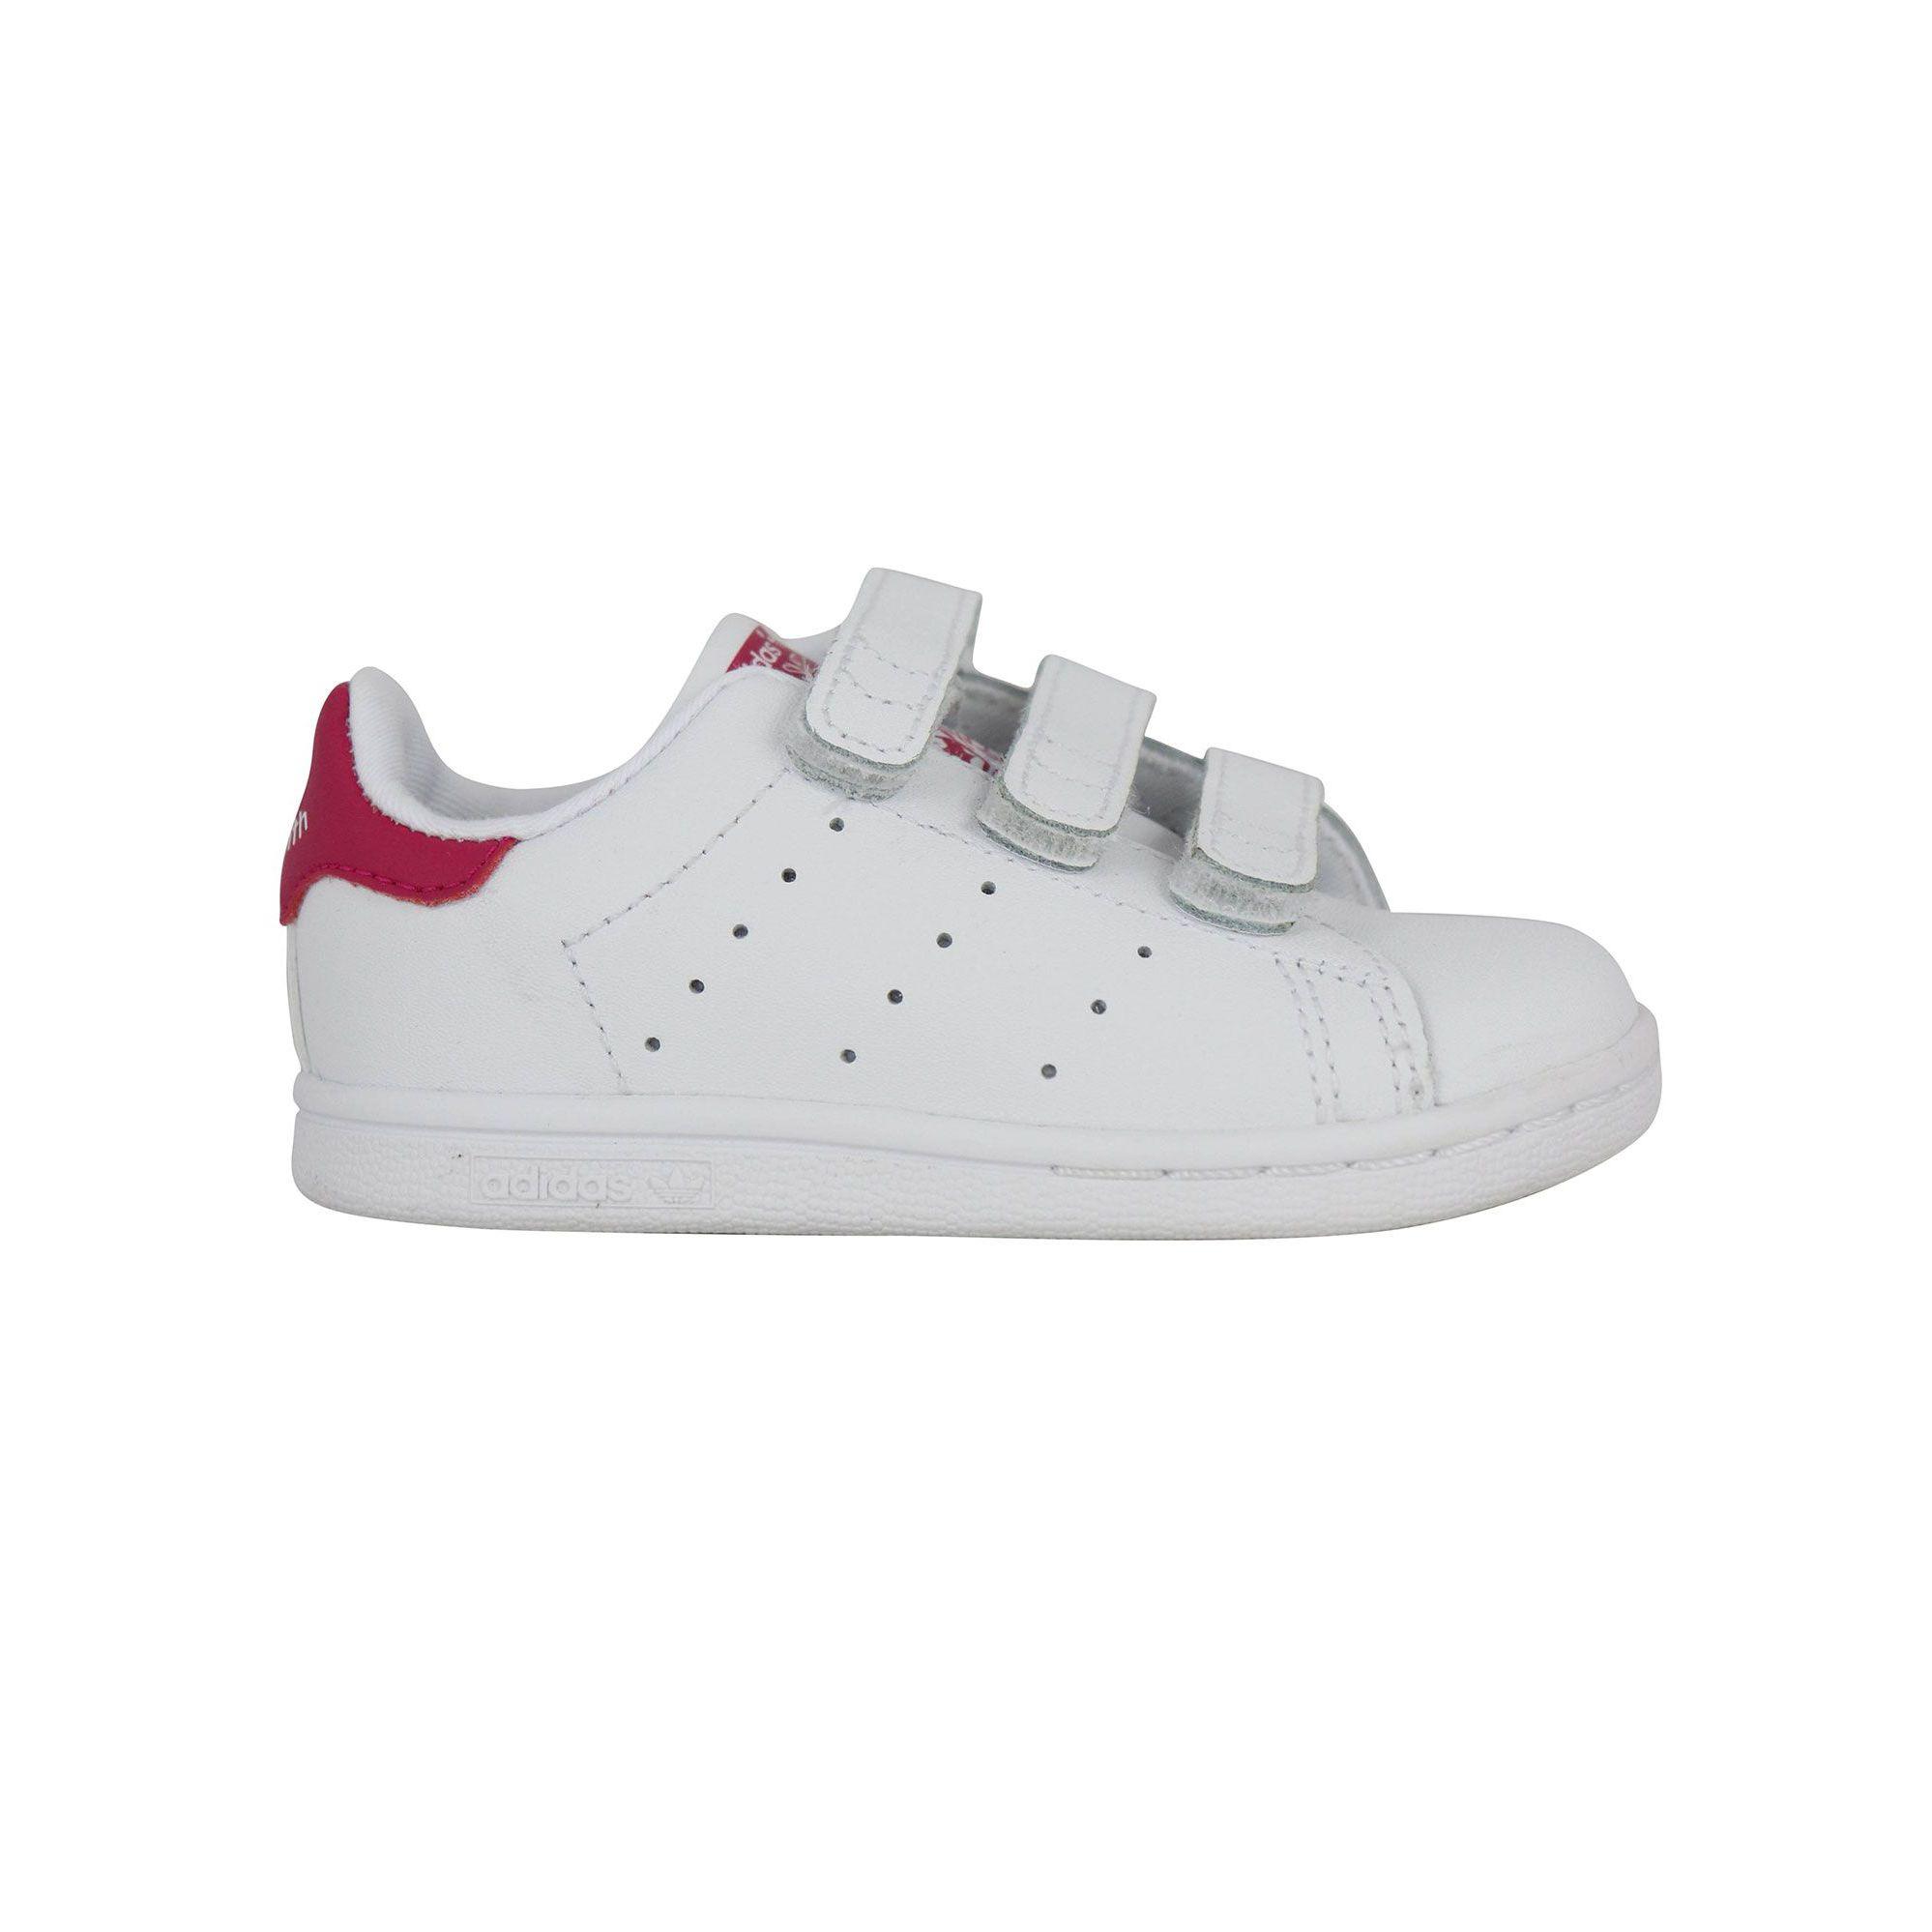 223 scarpe sneakers bambino adidas